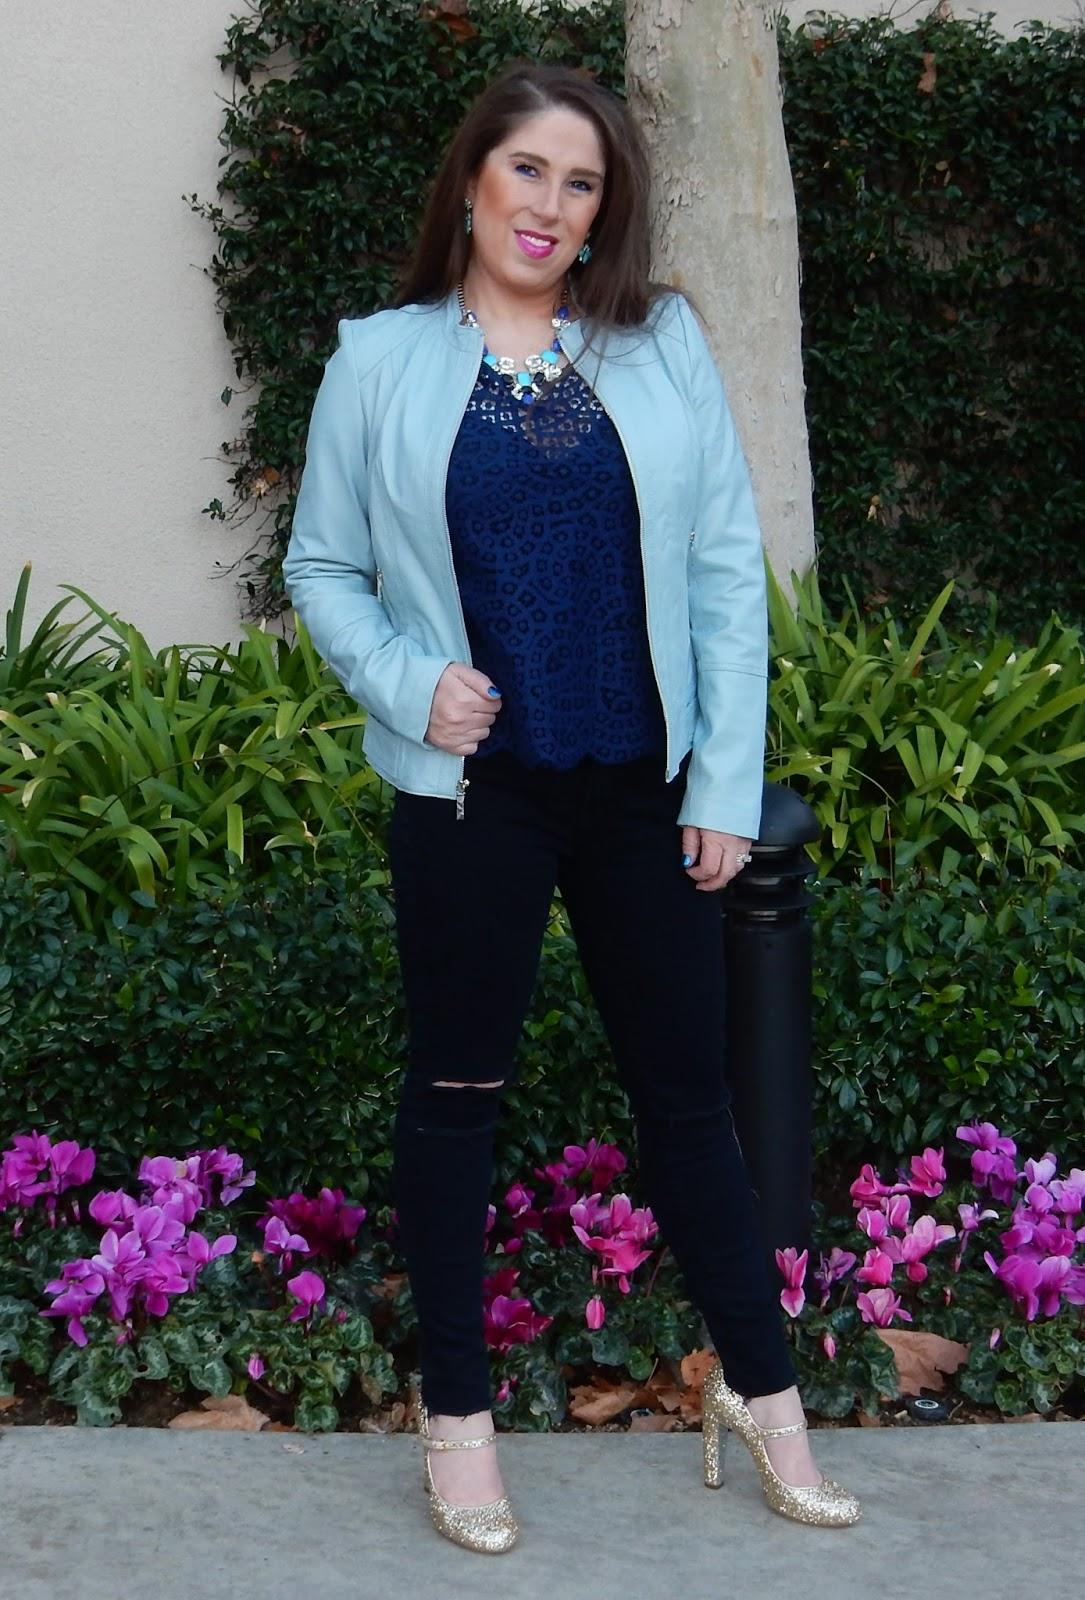 Marisa Stewart High Heeled Brunette Neiman Marcus brand Fashion and Style.